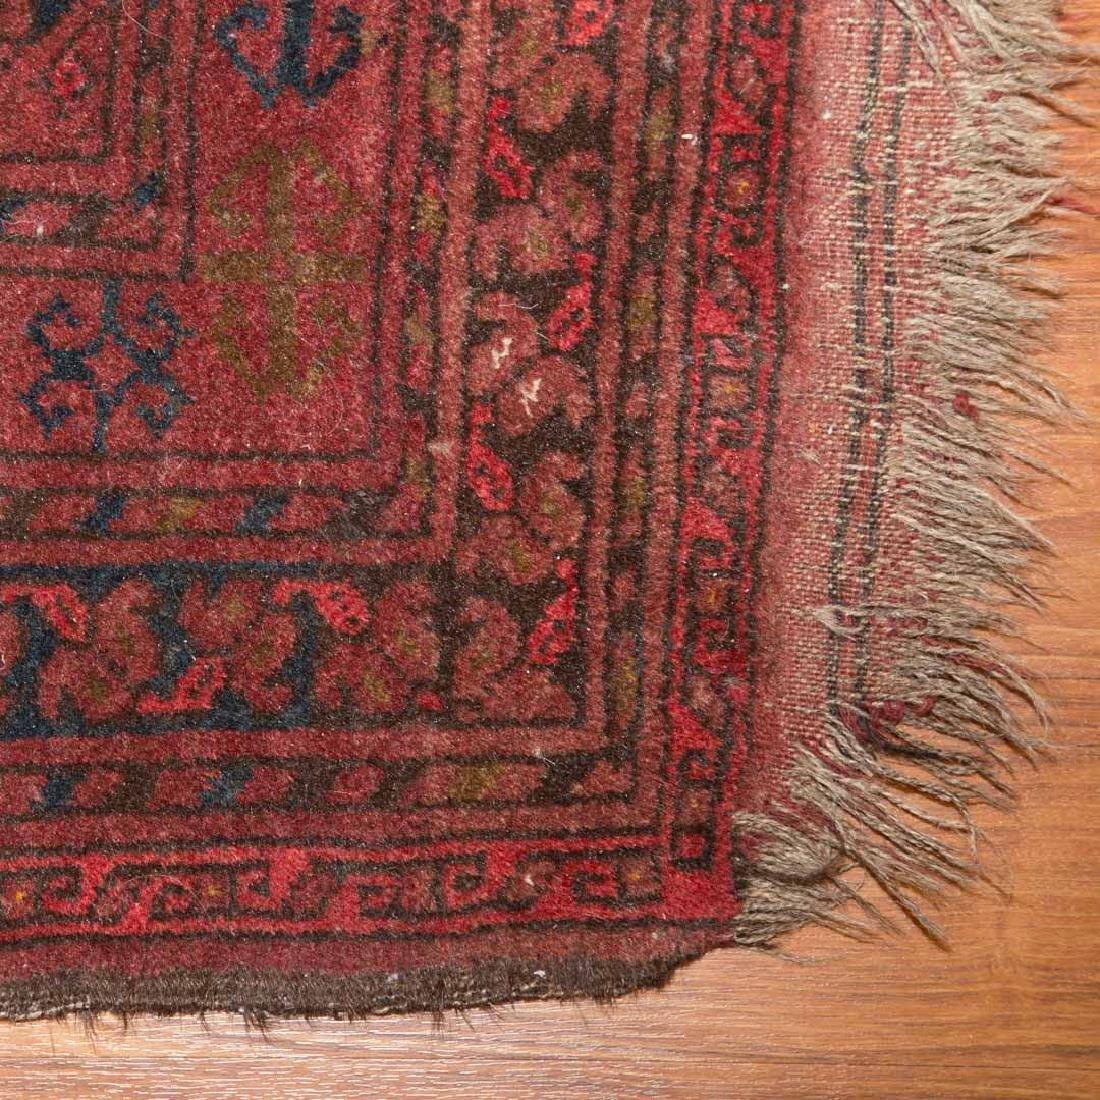 Two Afghani tribal rugs, Afghanistan, circa 1960 - 5